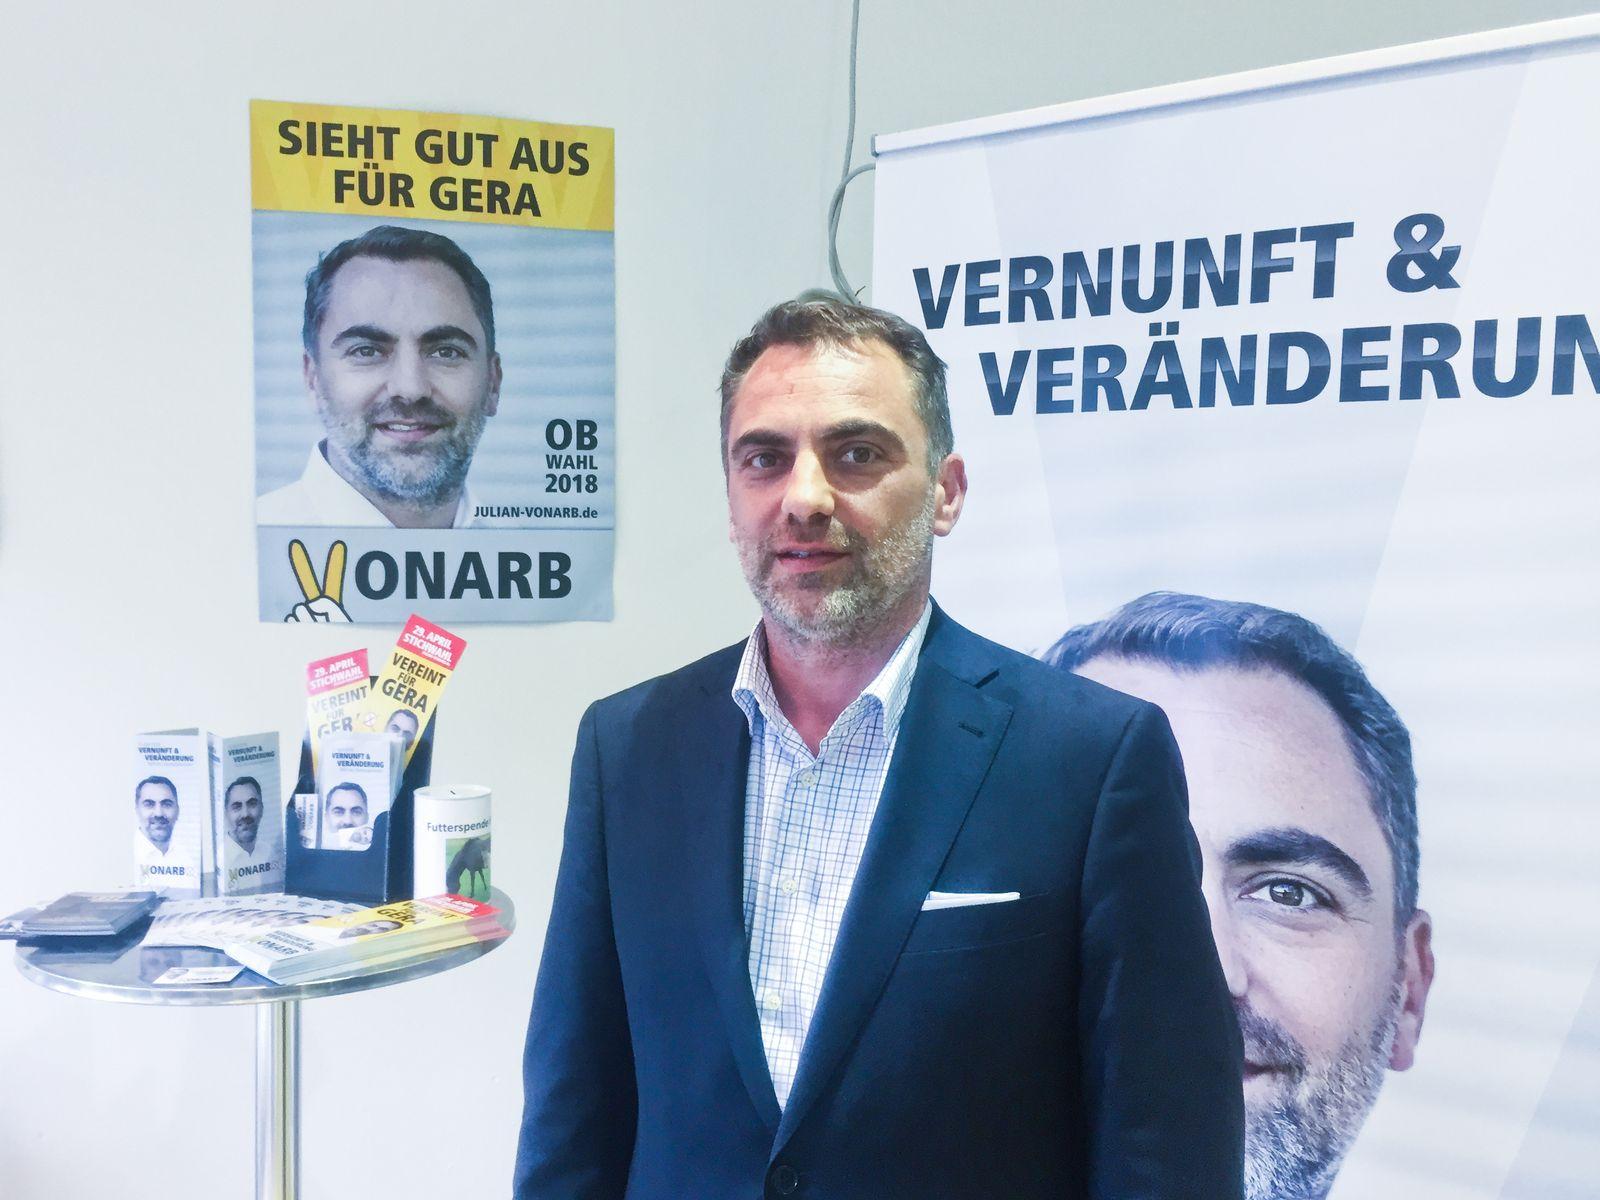 Gera/ Julian Vonarb/ Kandidat Oberbürgermeister Gera